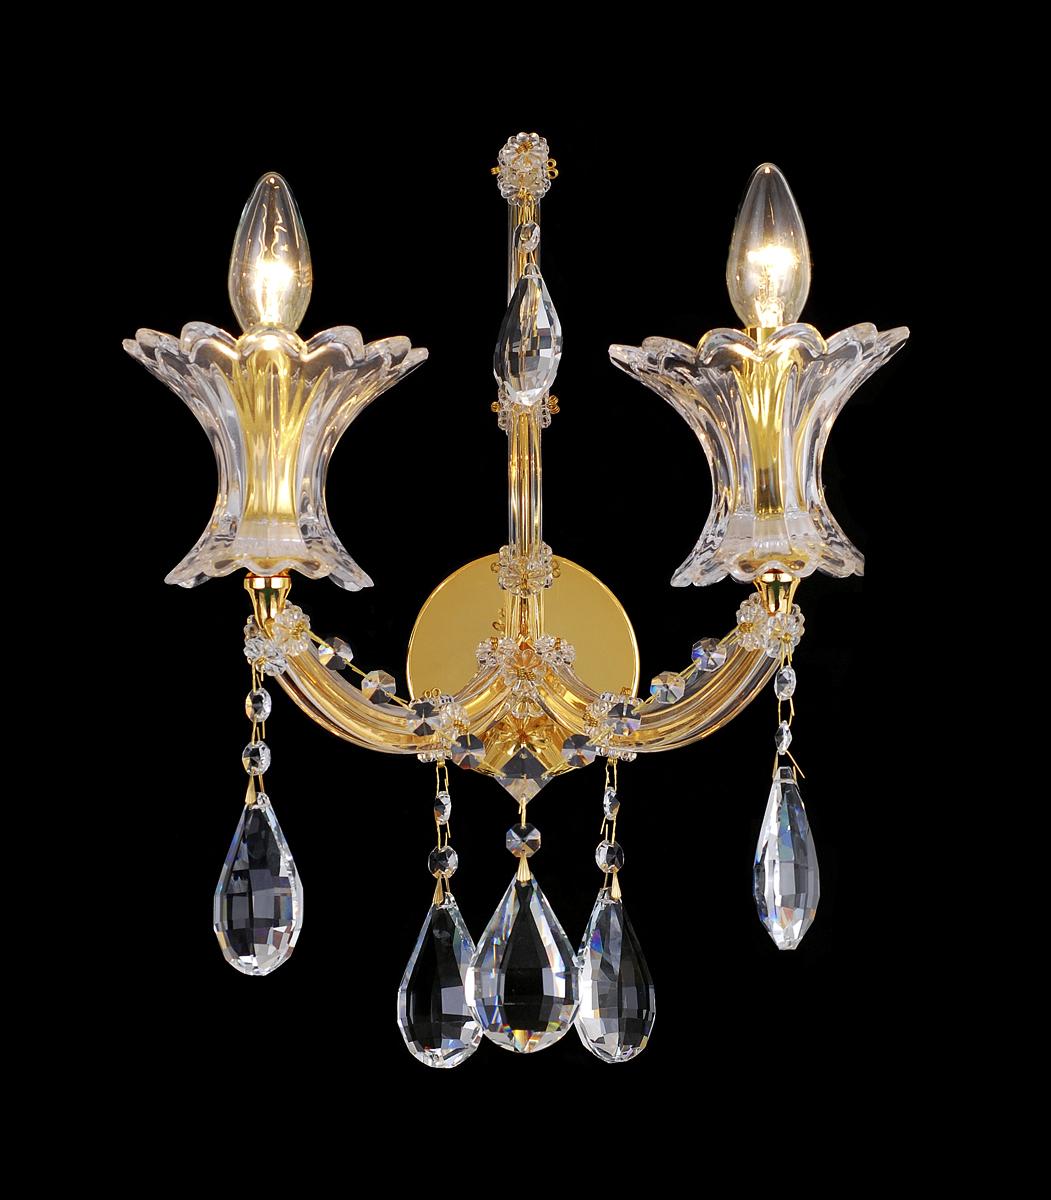 Бра Natali Kovaltseva Venezia 10650/2W GOLD, CLEARVenezia 10650/2W GOLD, CLEARD35 x H28 cm